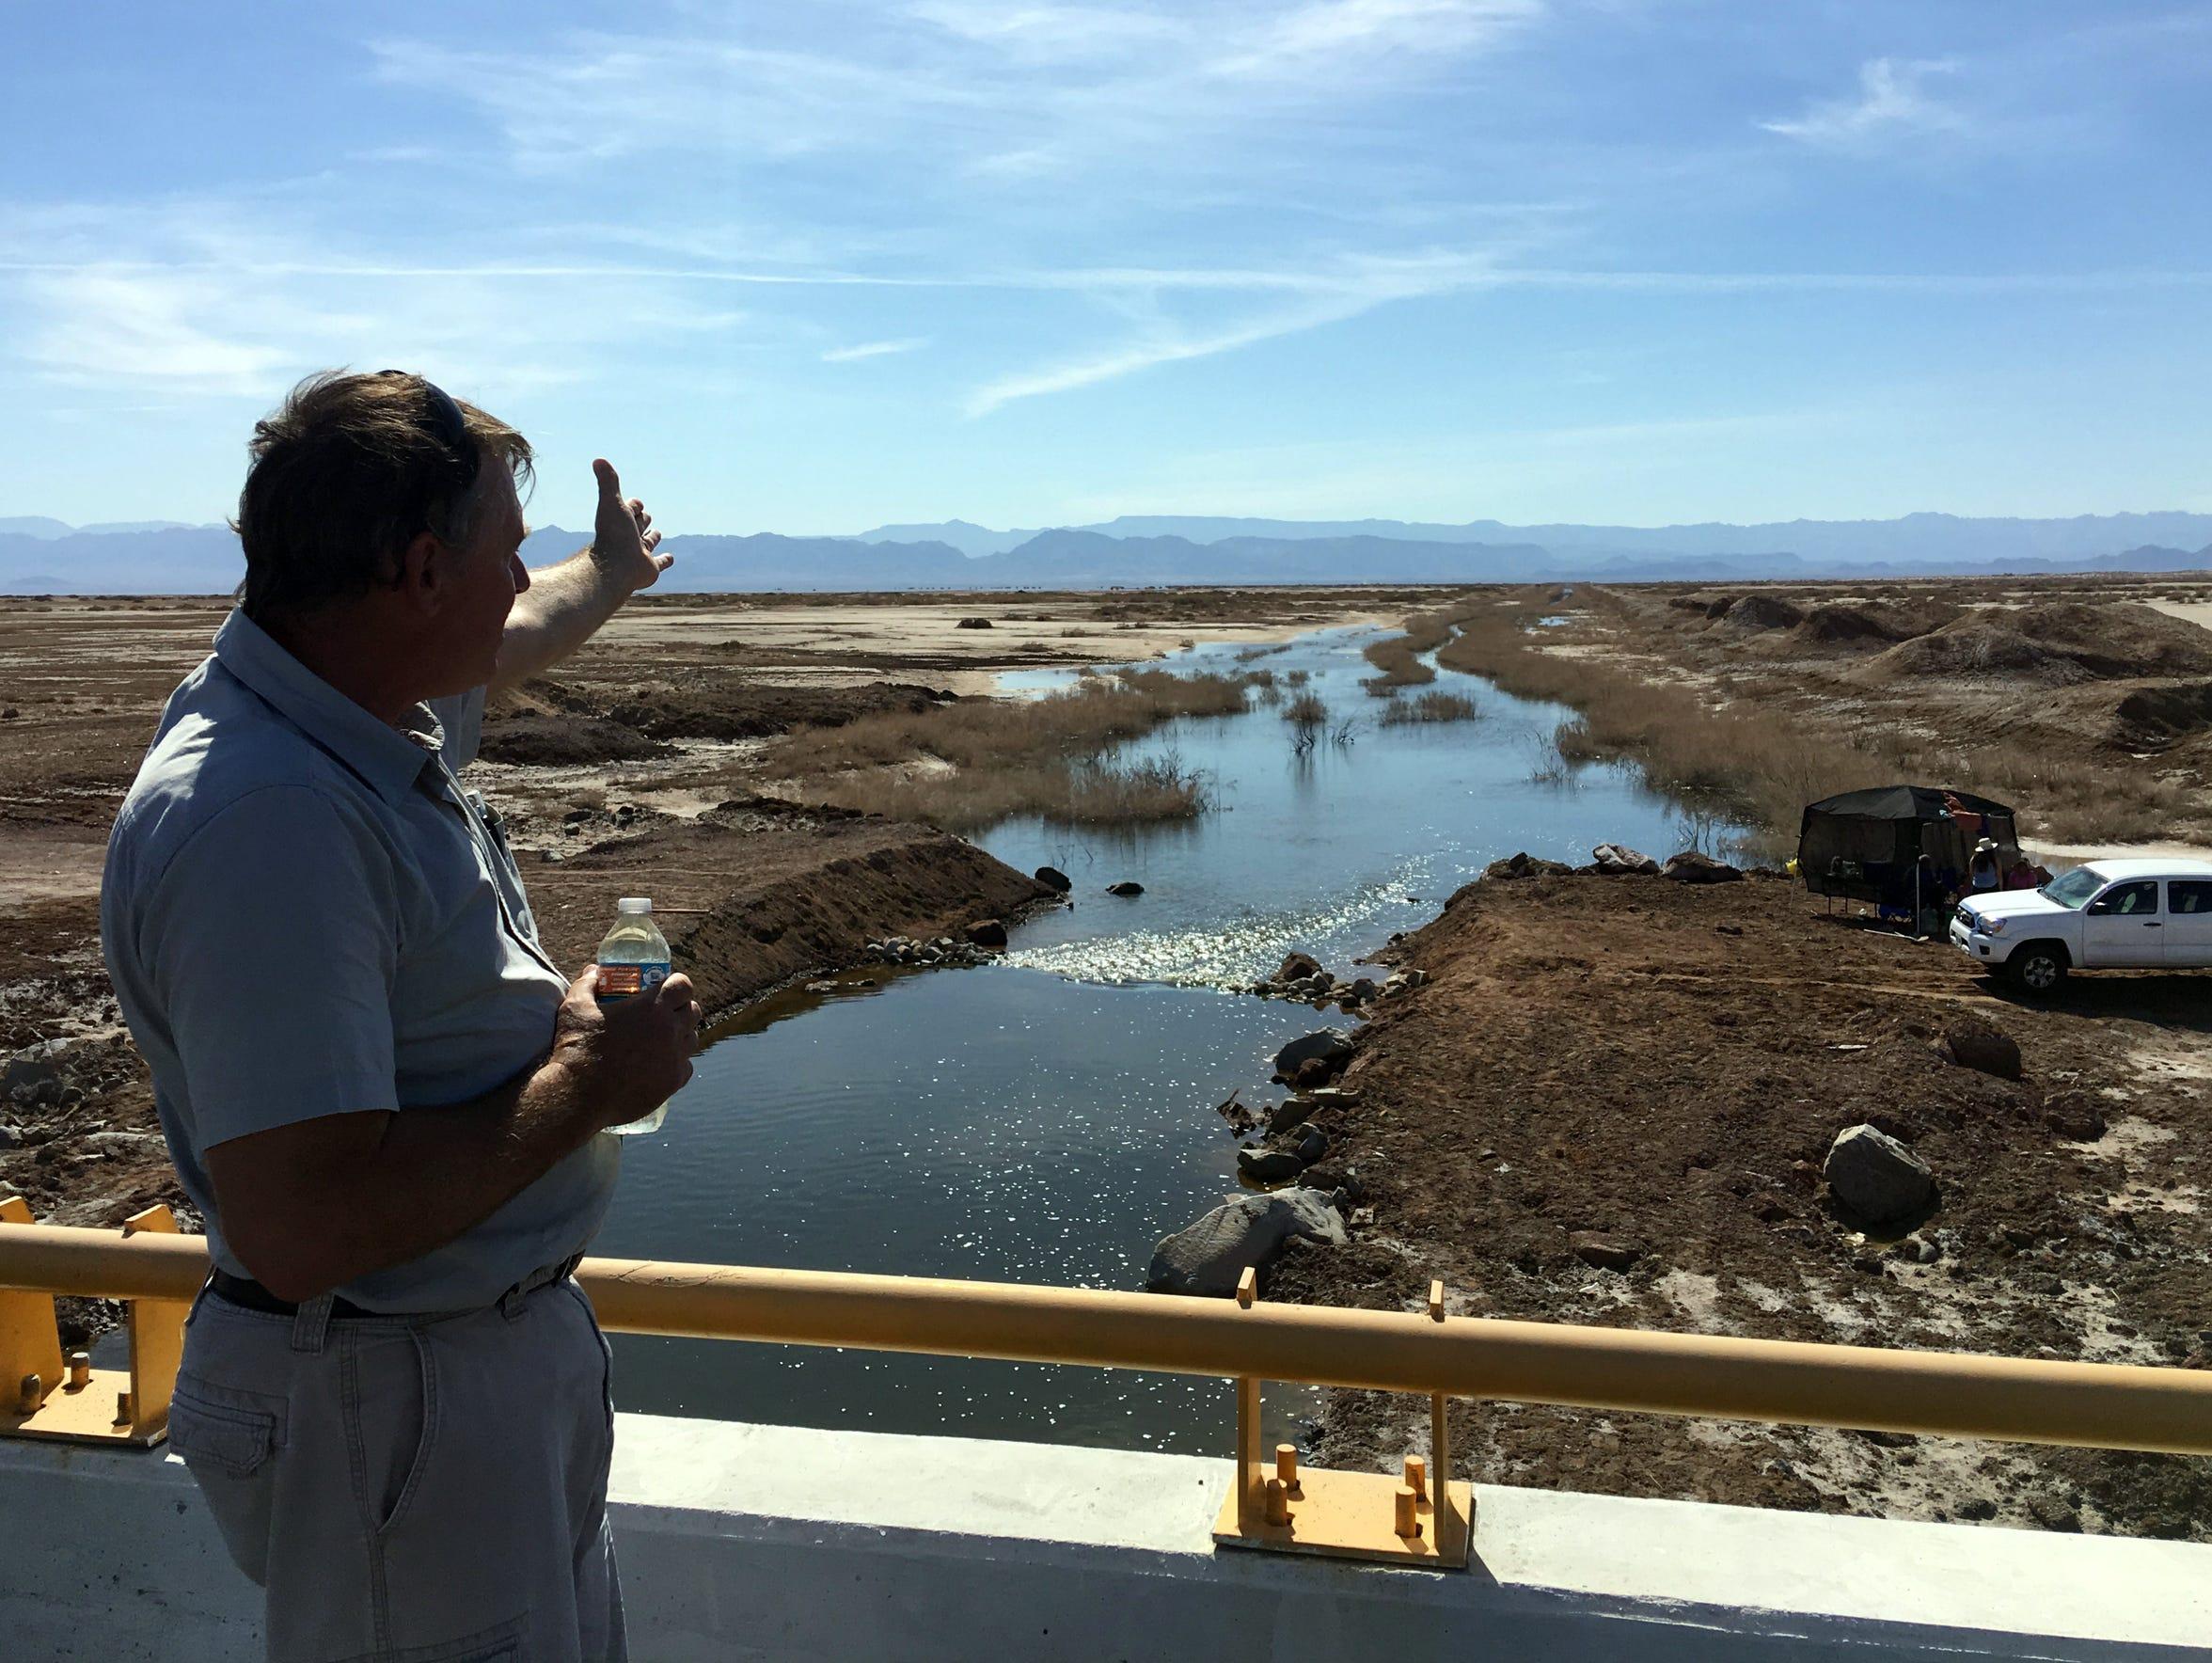 Tom Sephton, who runs a desalination plant in the Salton